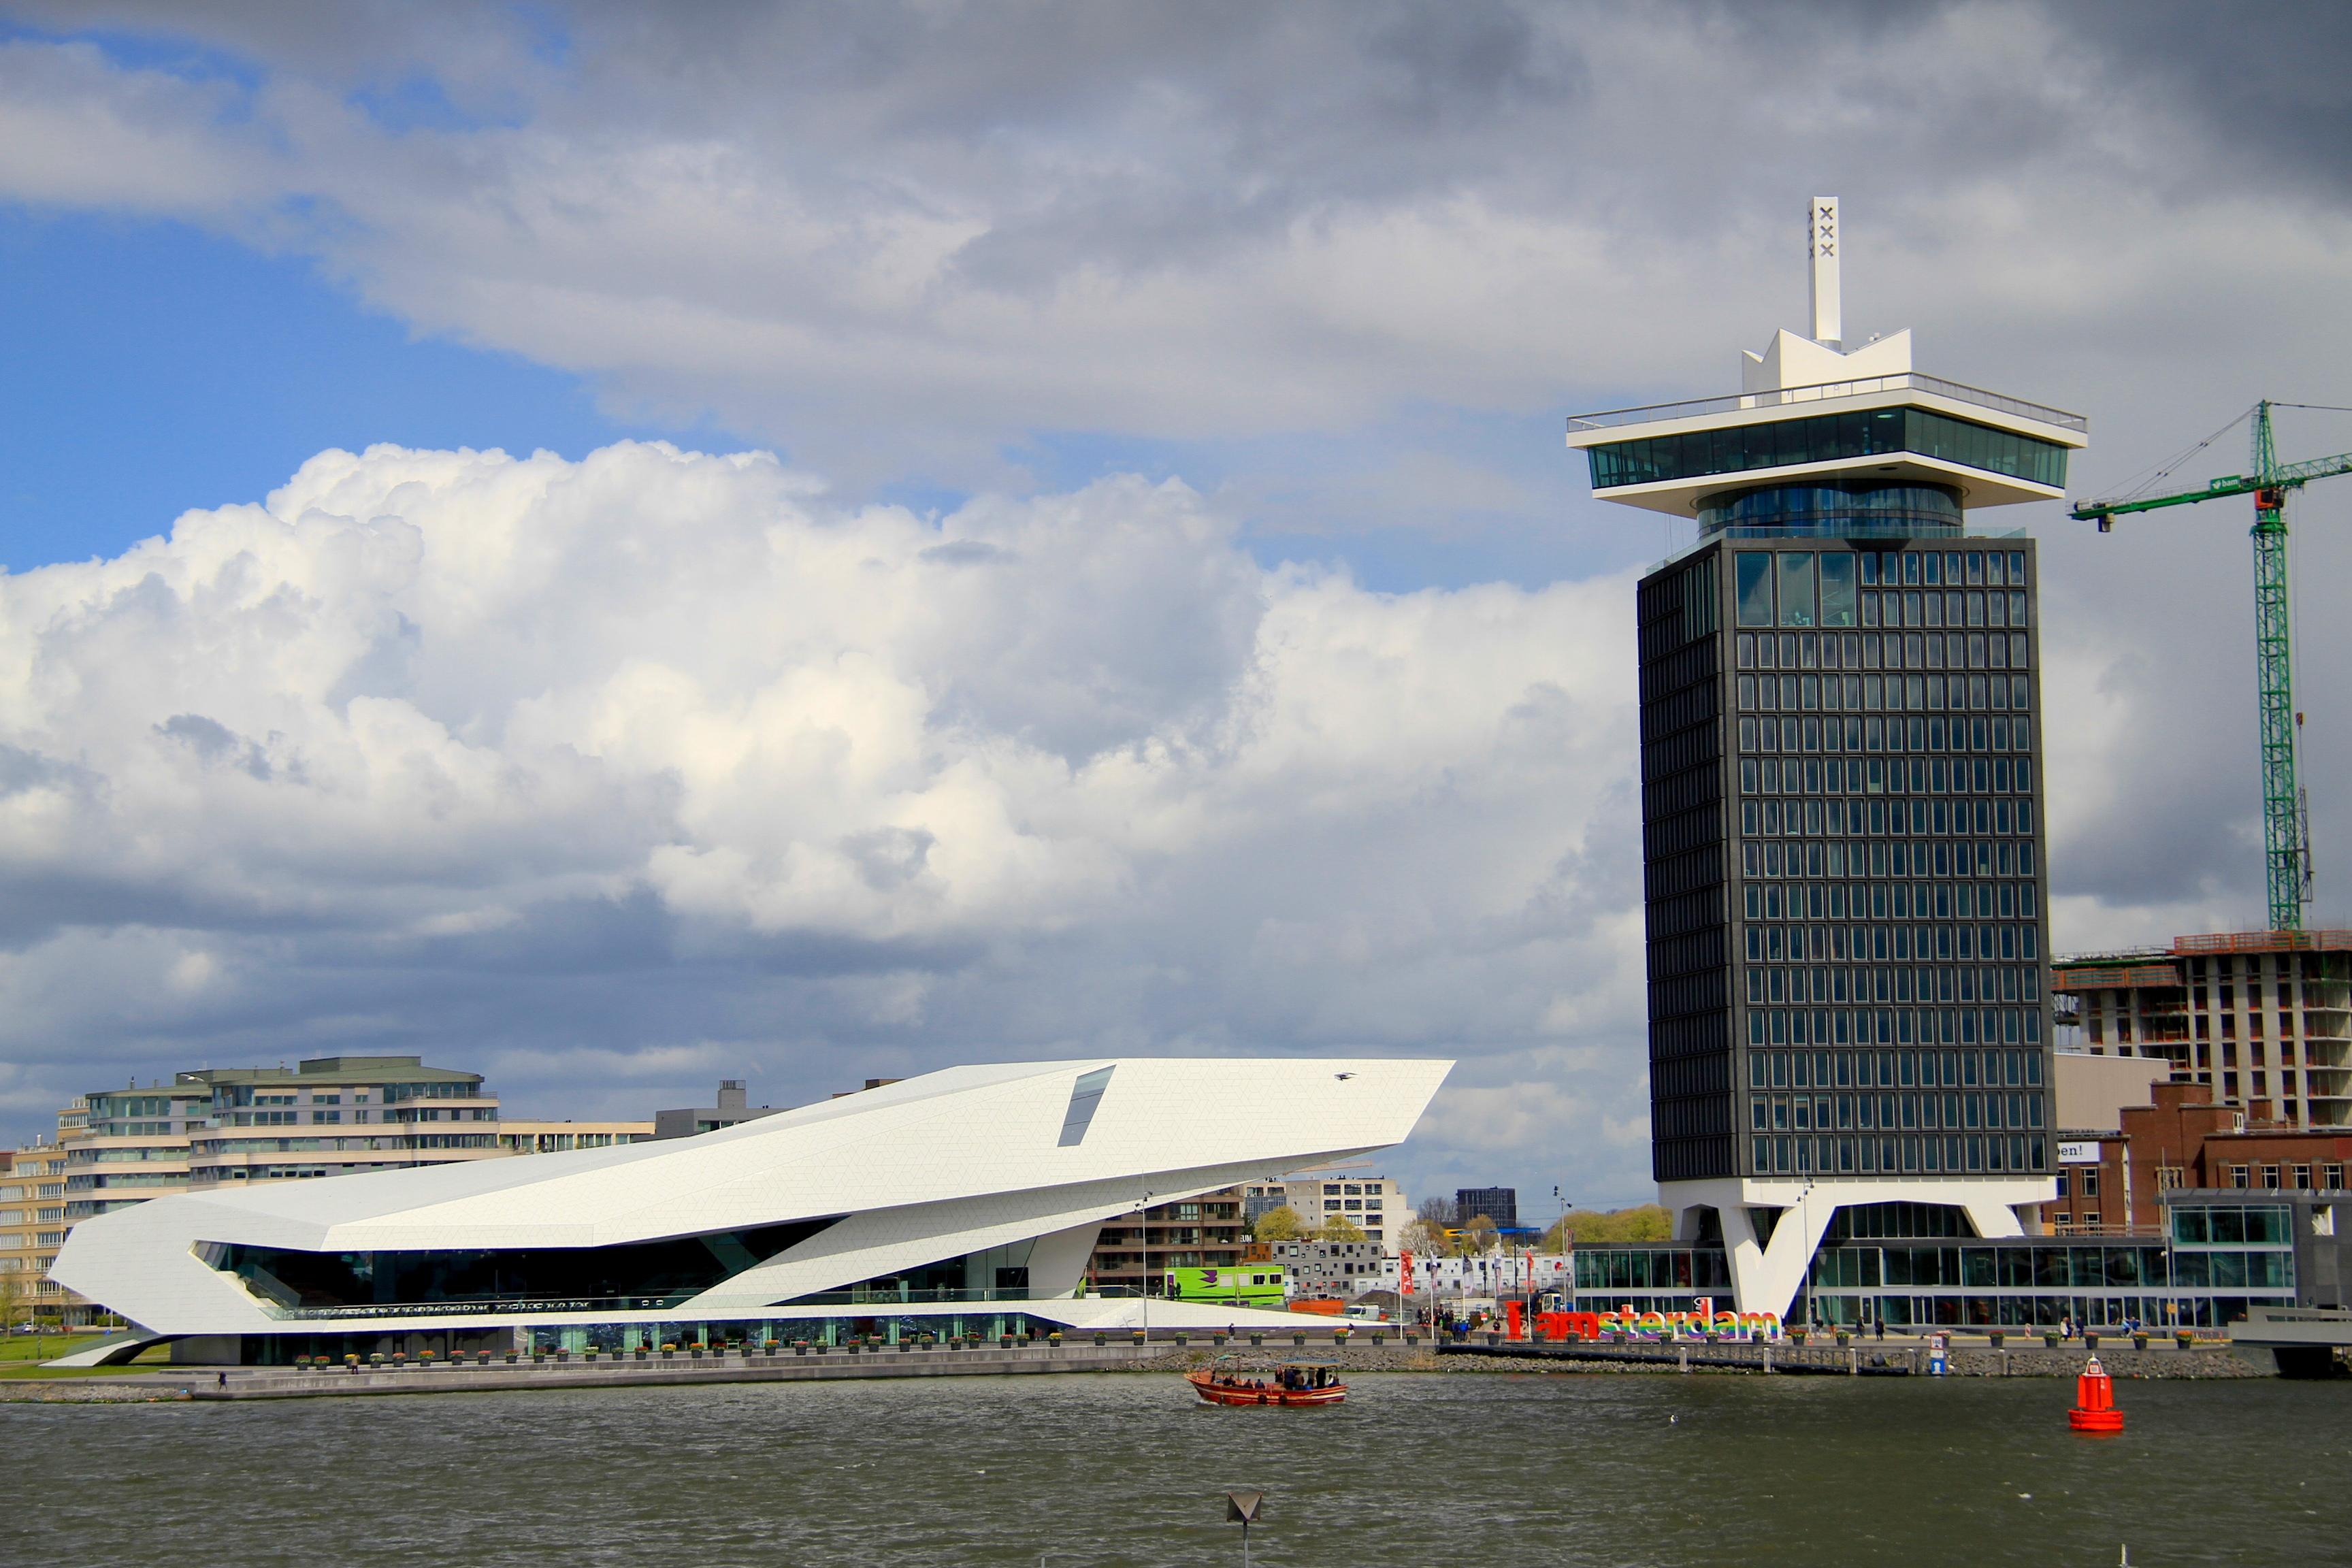 File:ADAM Tower & EYE cinema JPG - Wikimedia Commons